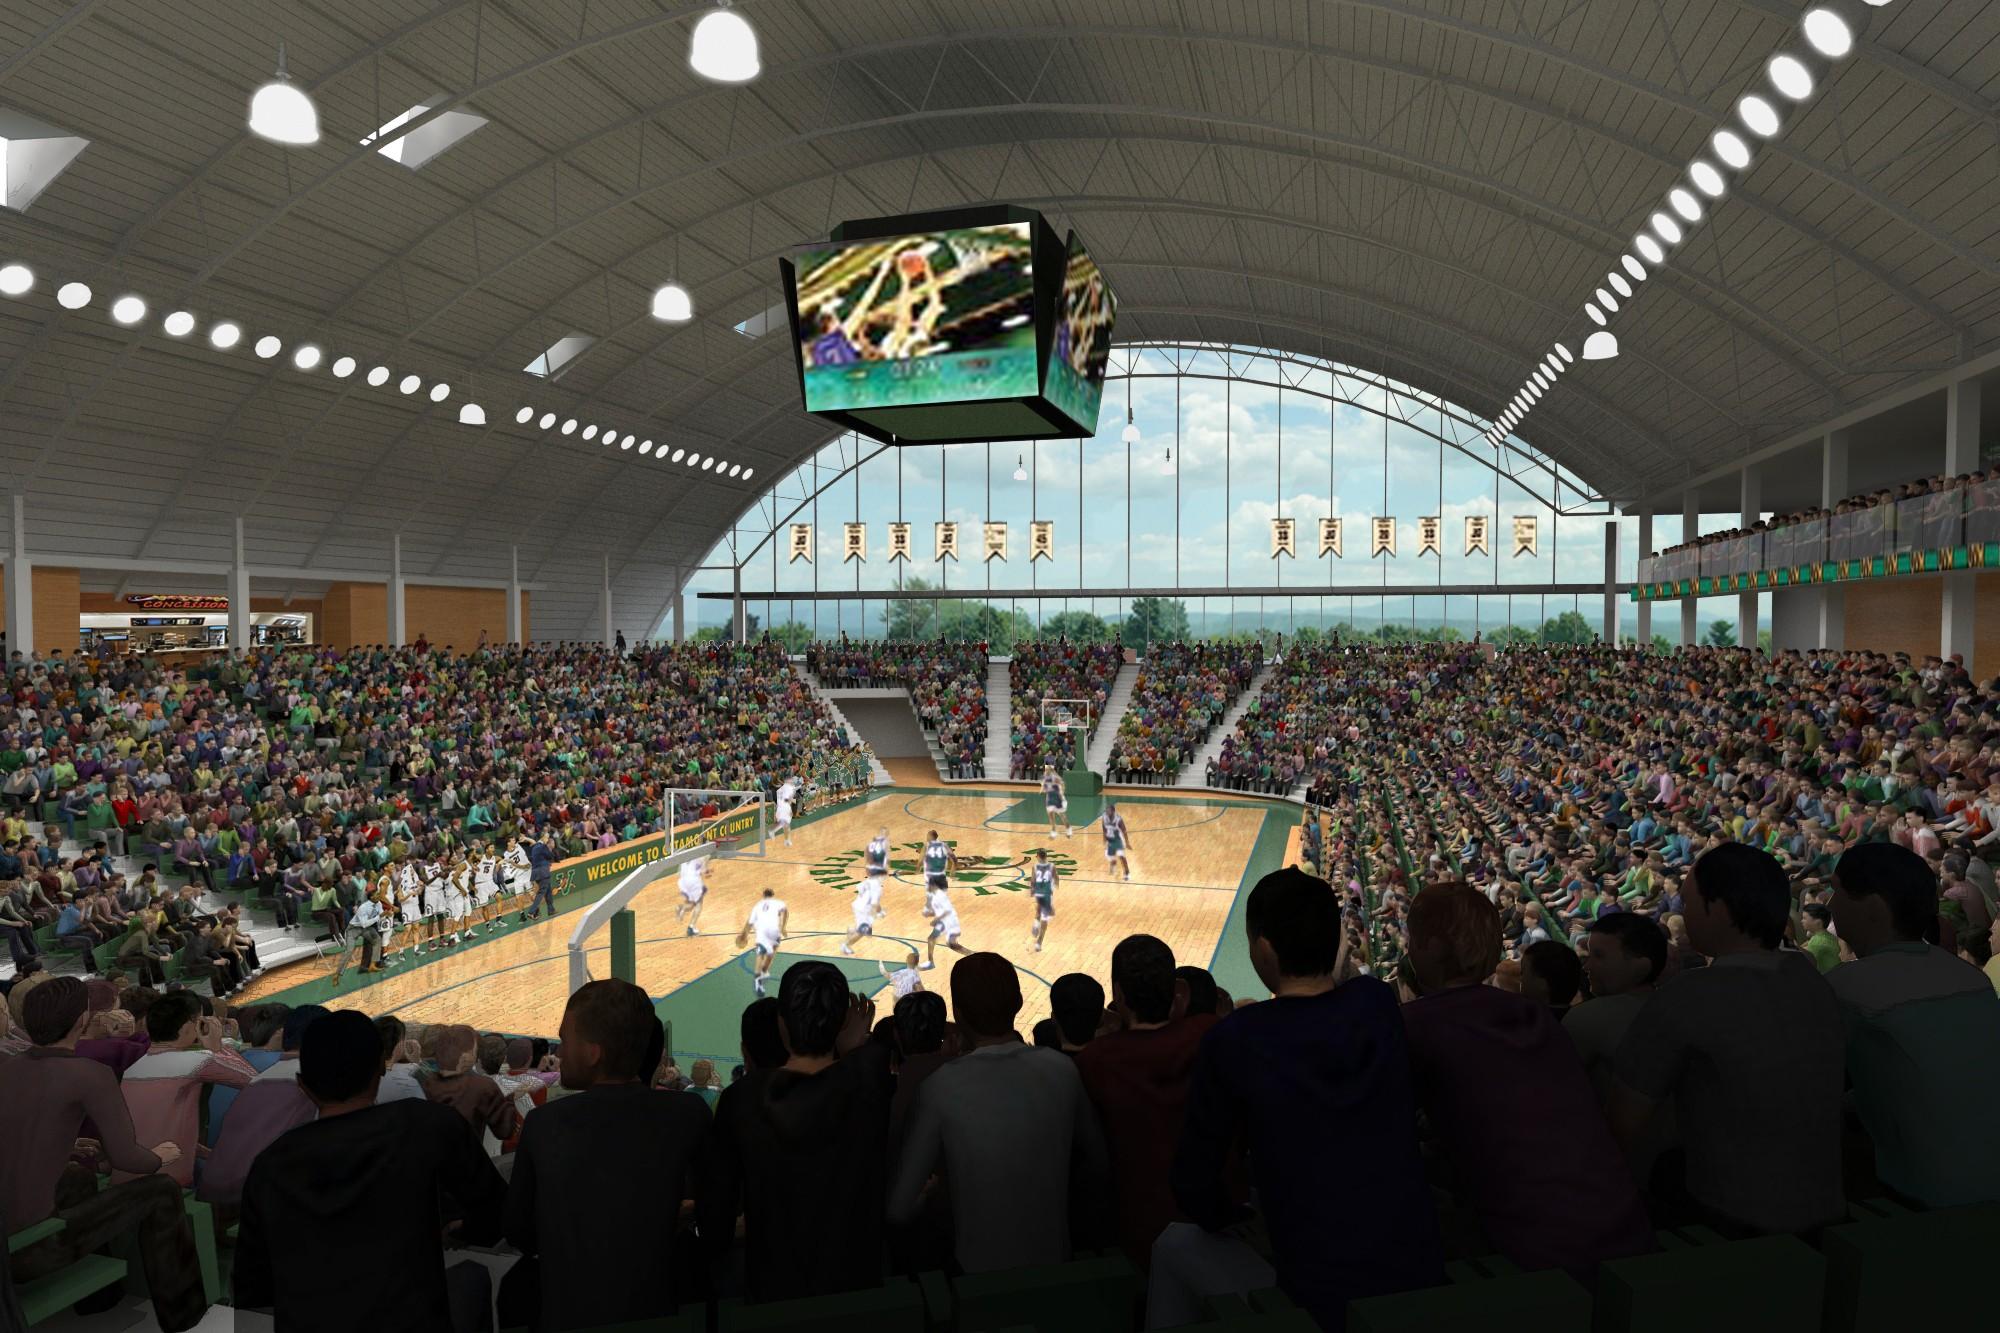 Uvm Calendar 2022.Uvm Proposes 80 Million Athletic Facility On Campus Off Message